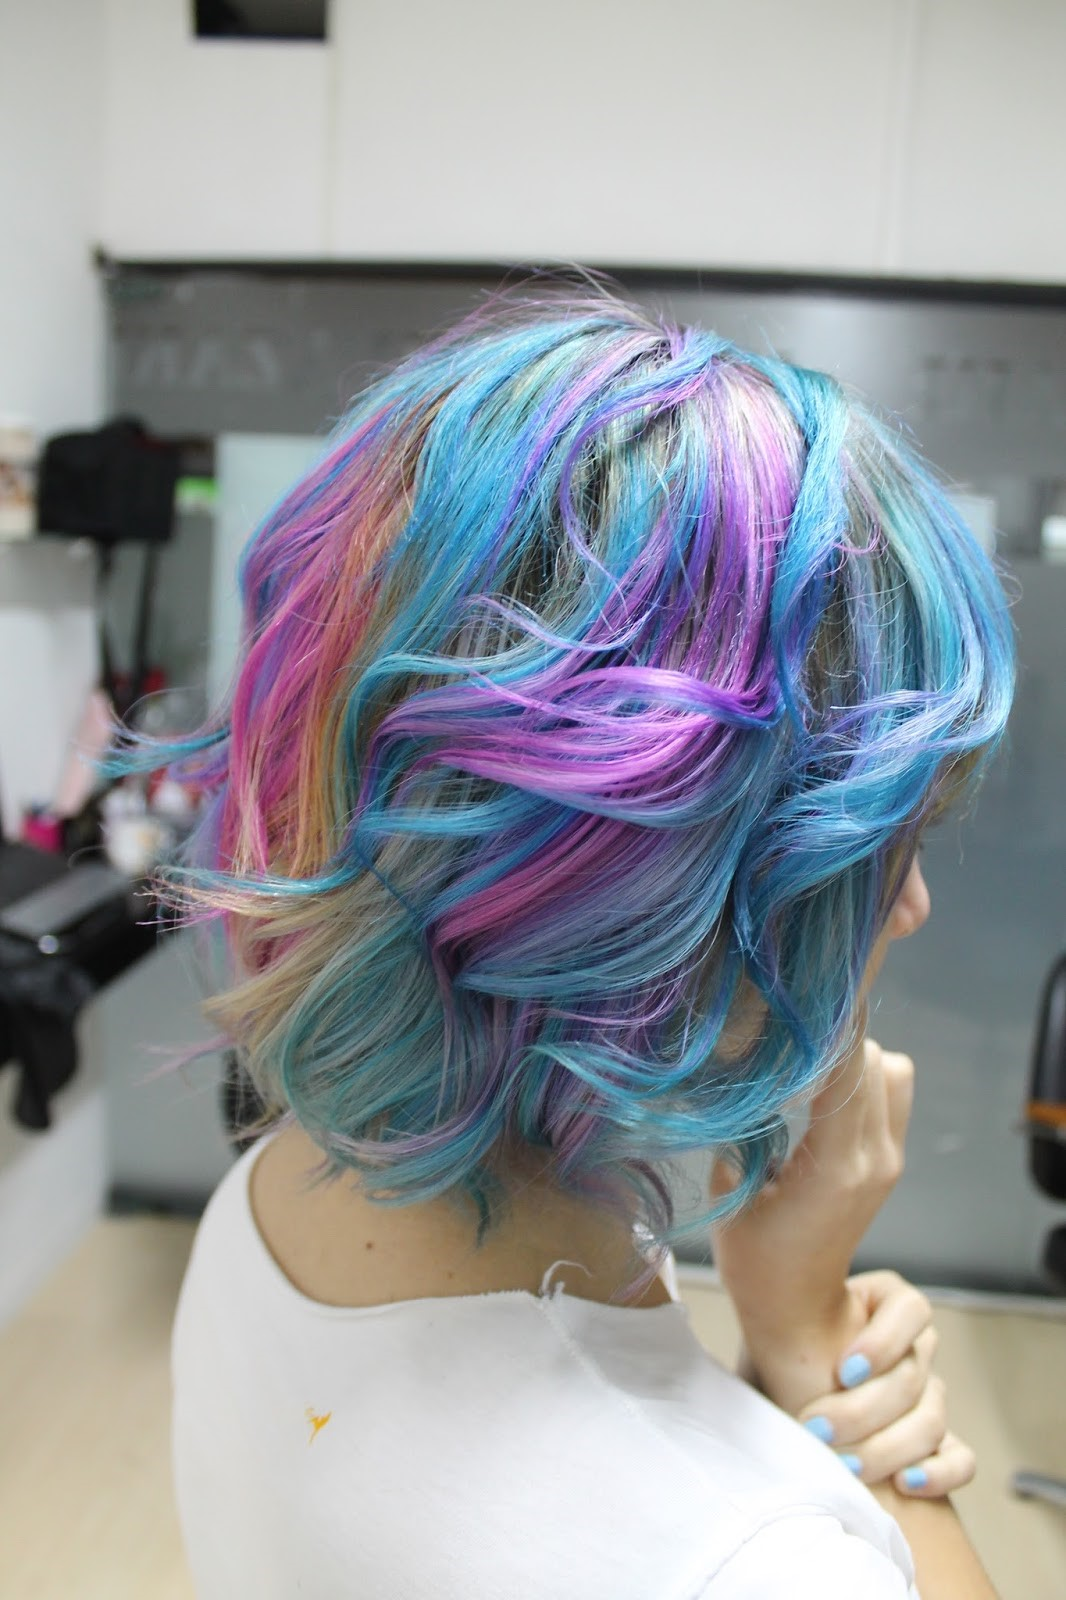 Cabelo repicado colorido